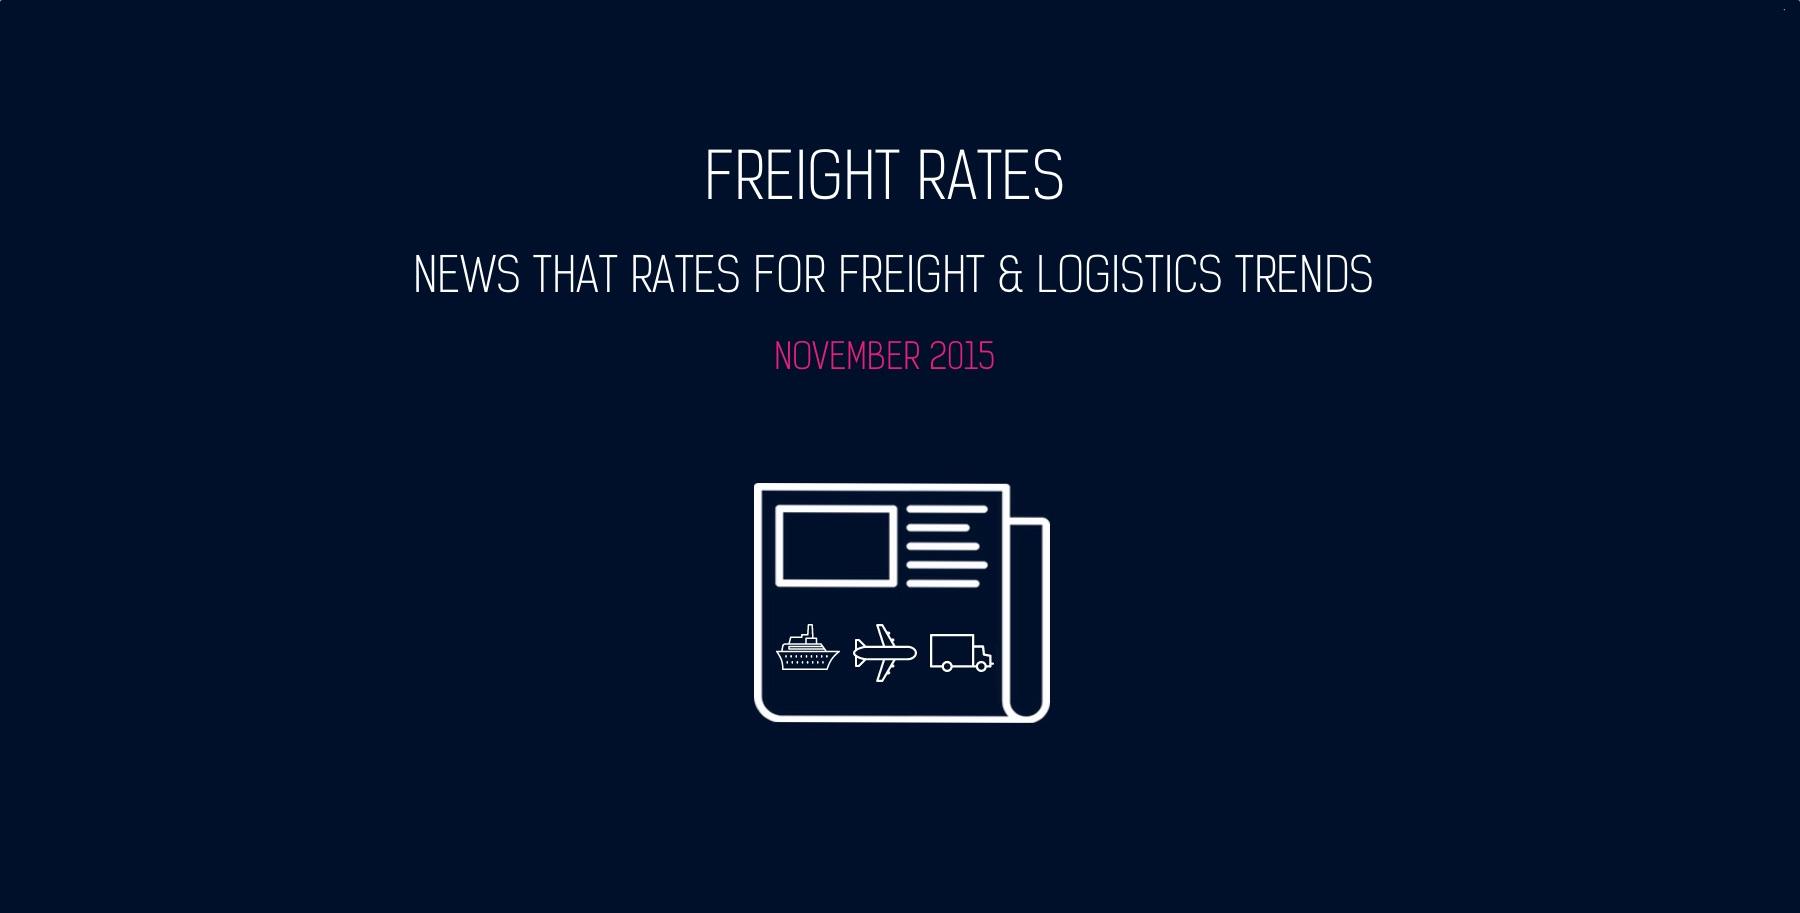 November 2015 Freight News